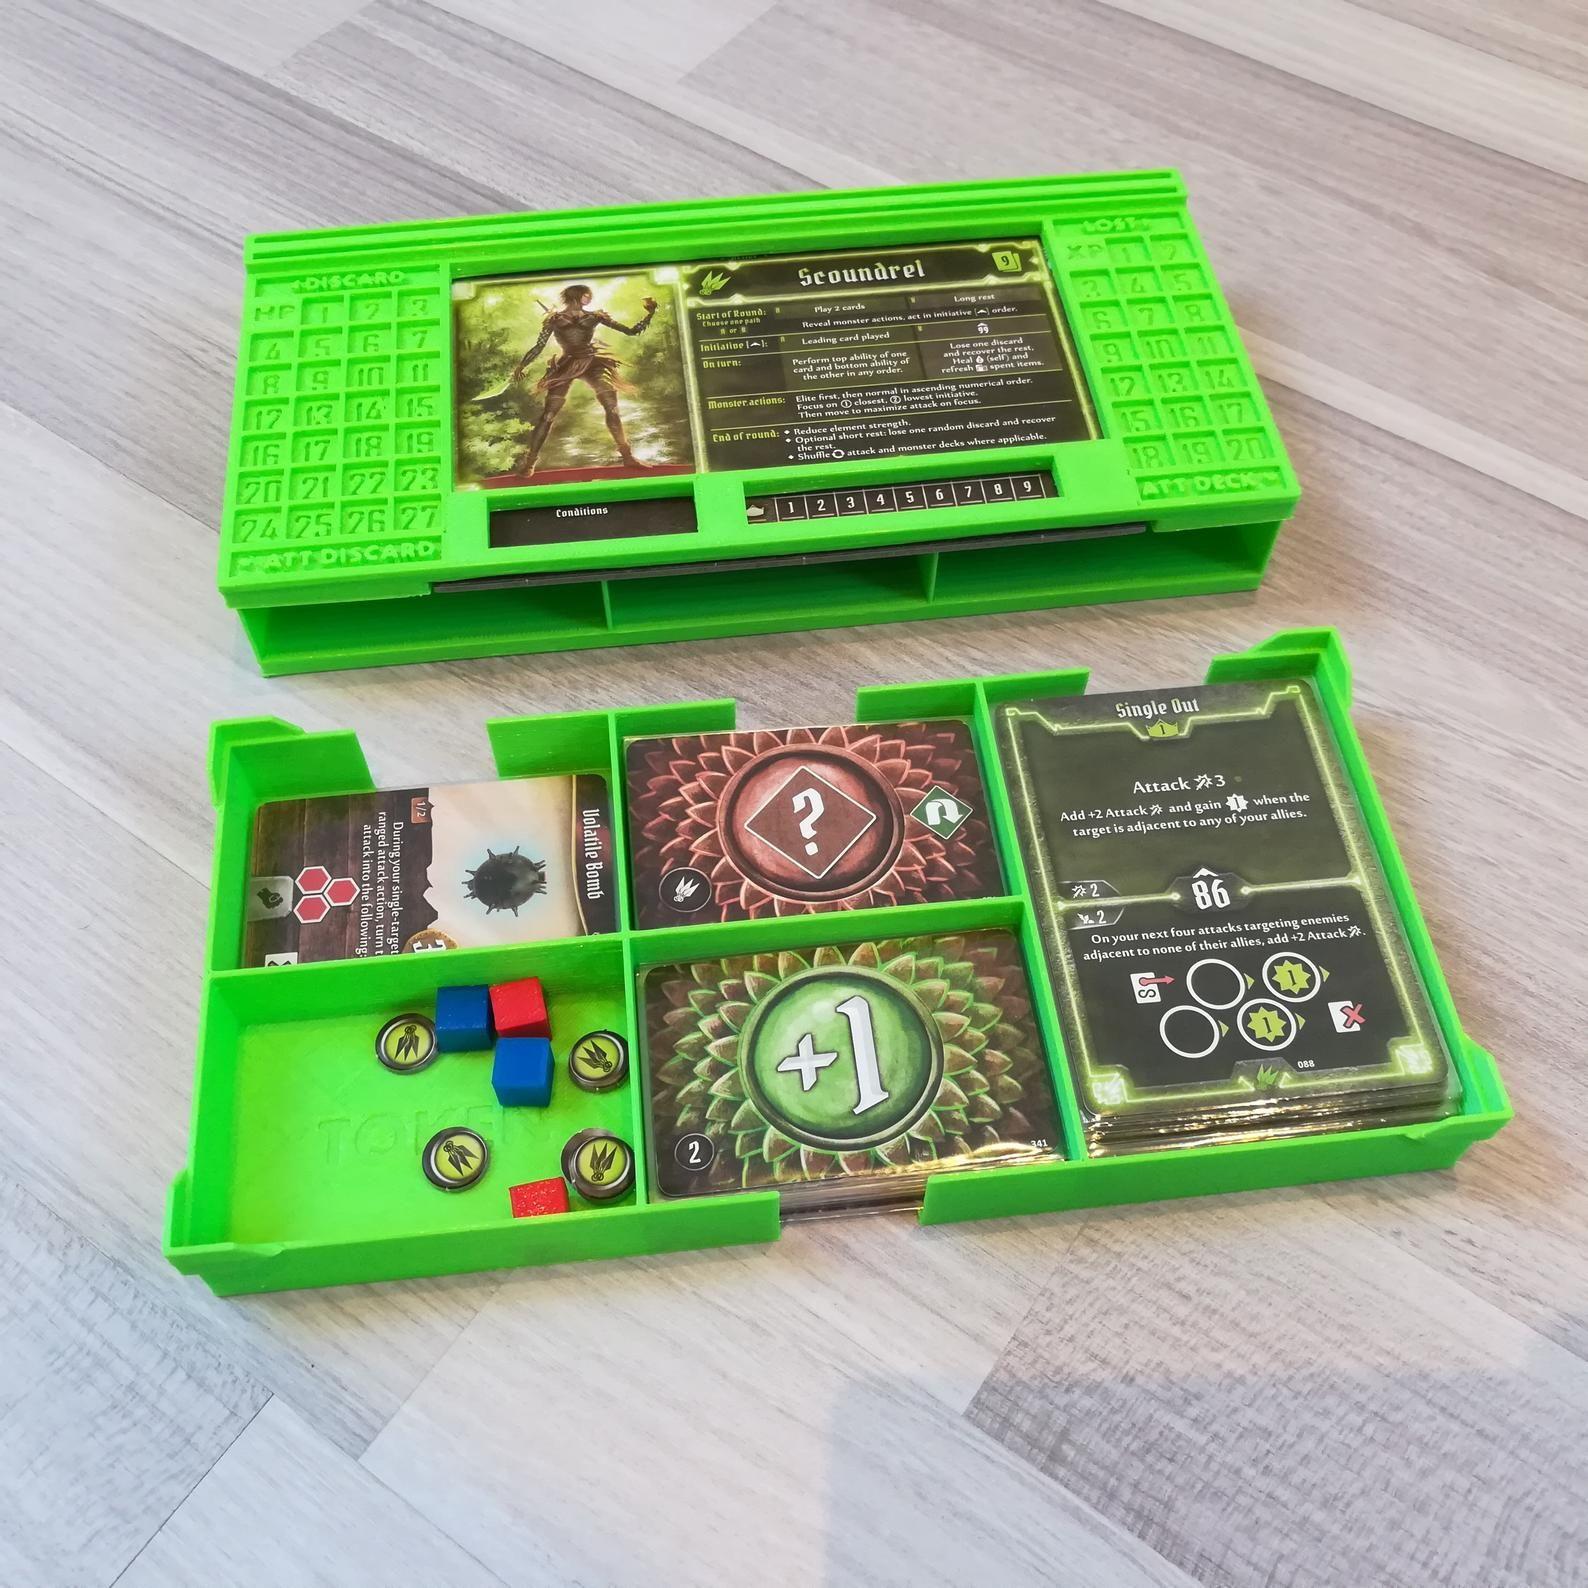 Gloomhaven Character Dashboard & Storage Board games, 3d